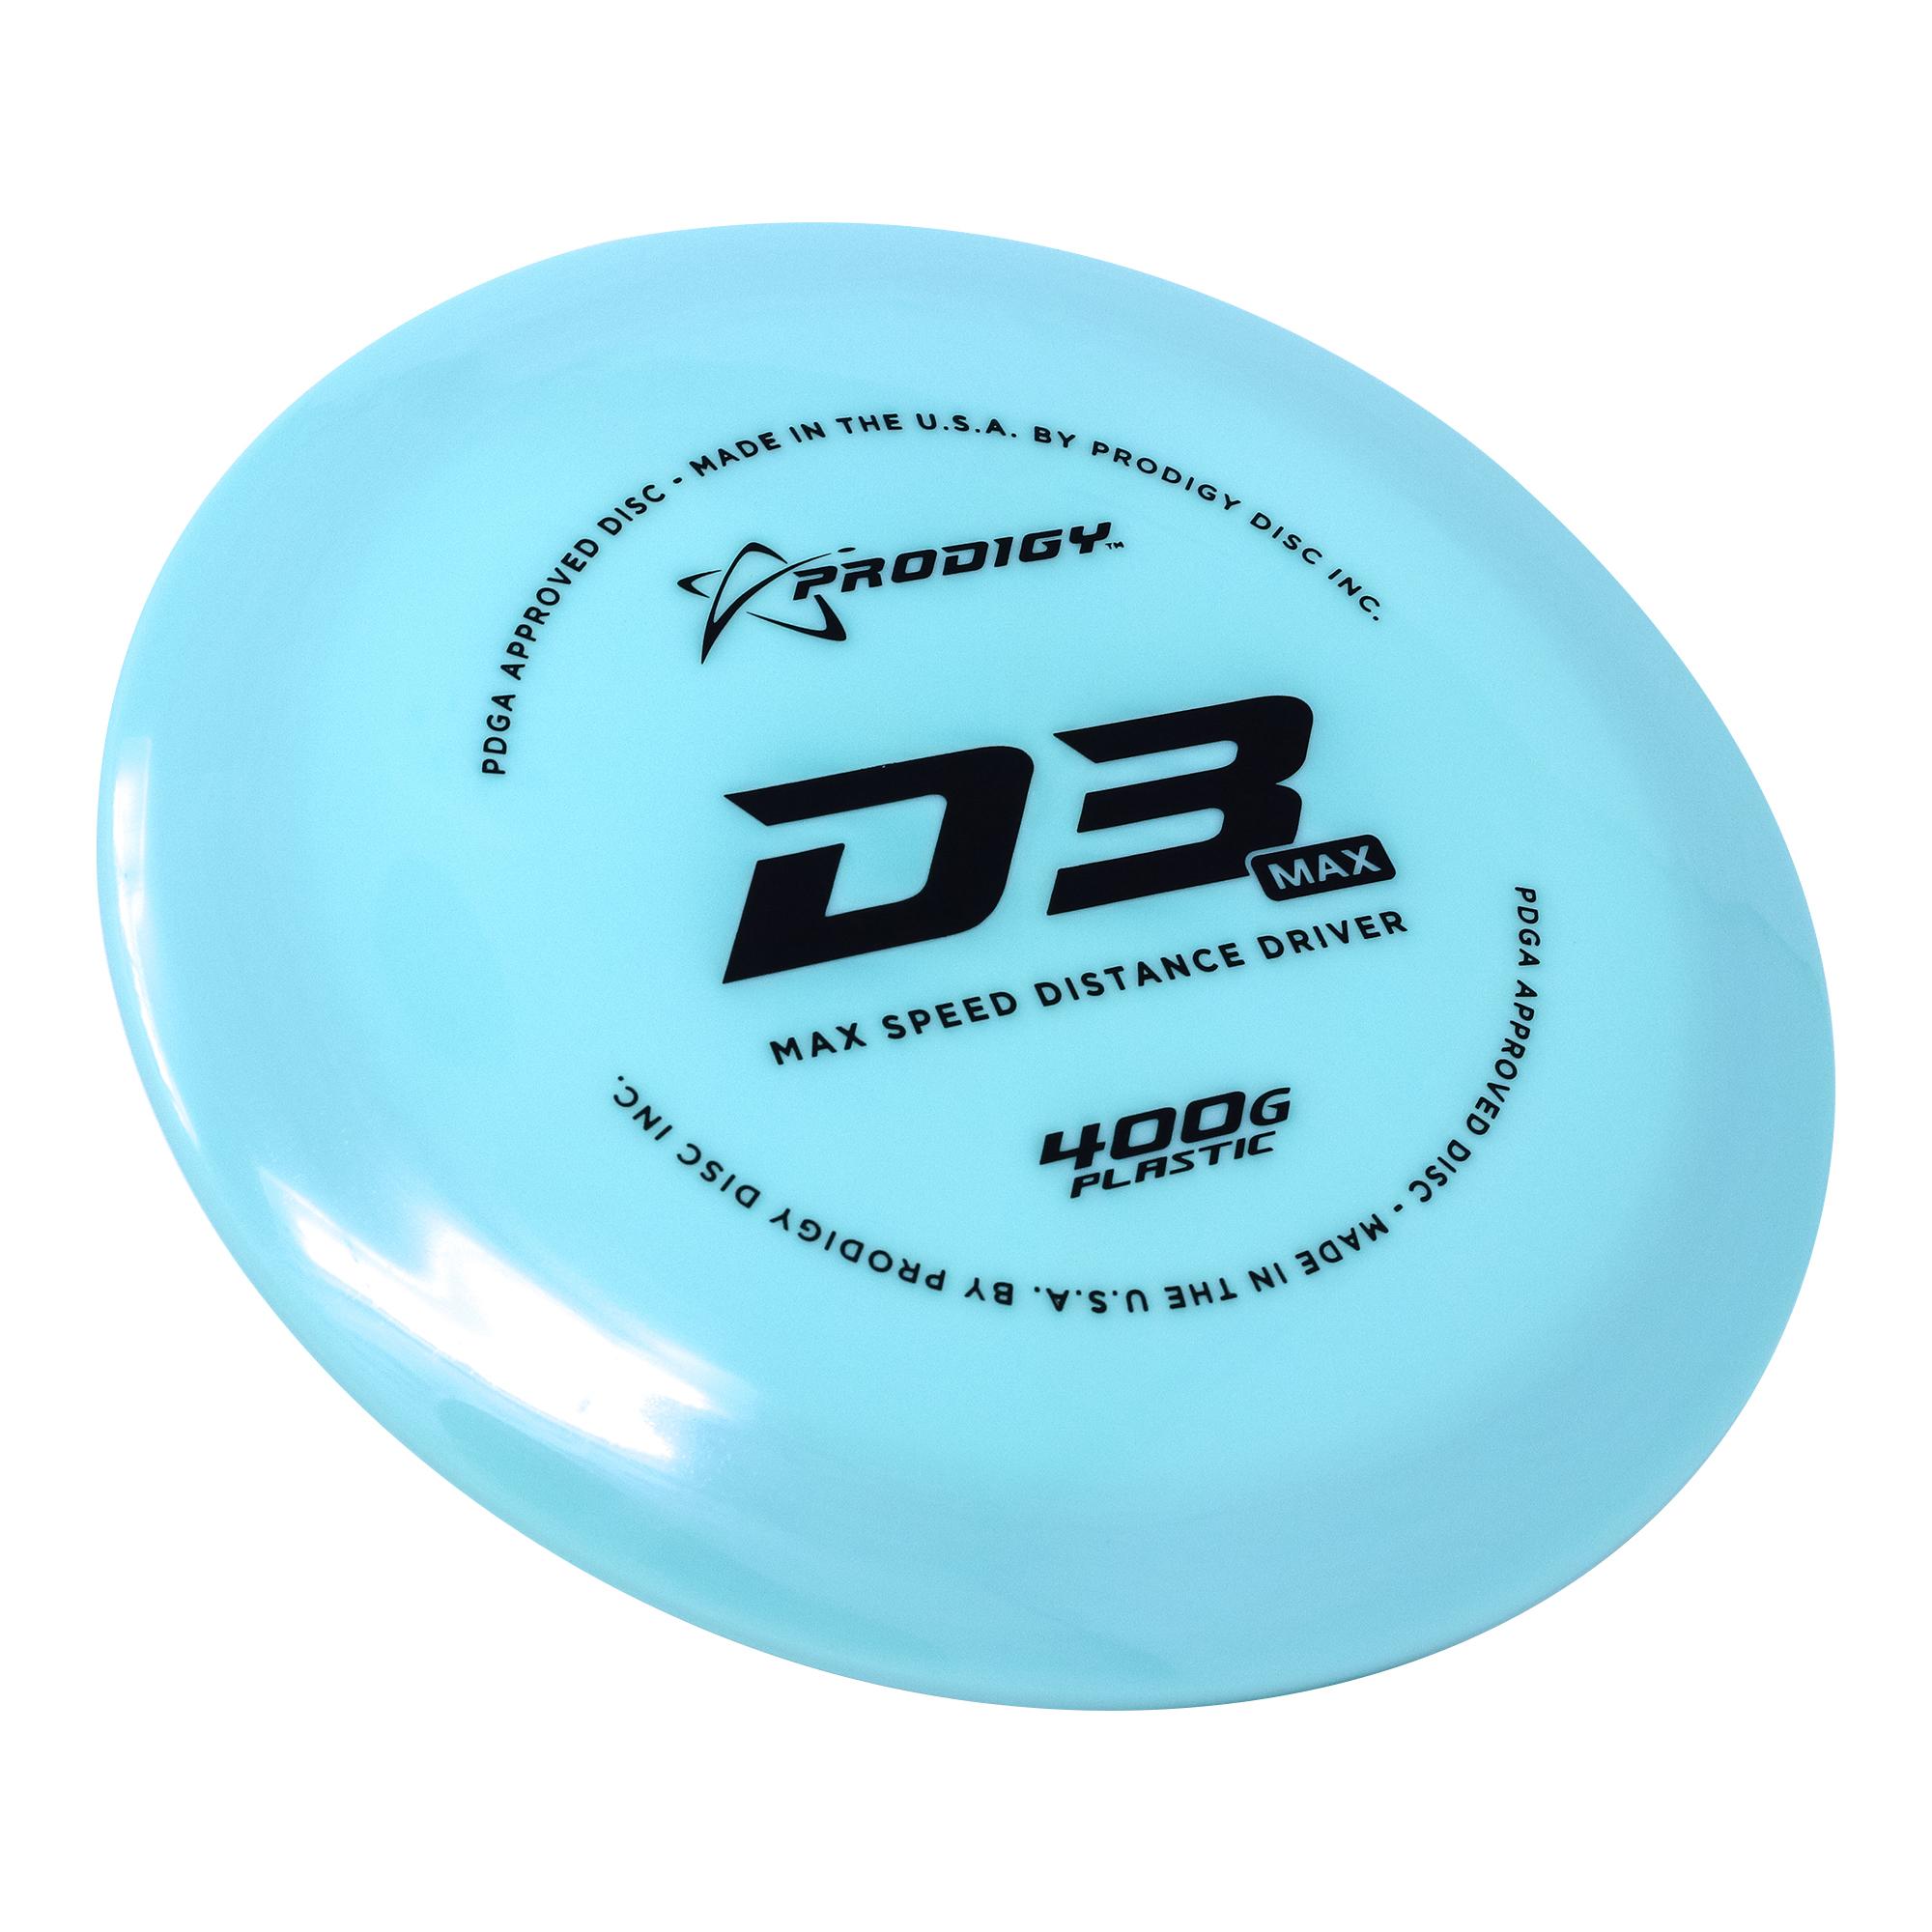 D3_max_400G_light_blue_front_angle_thumbnail.jpg